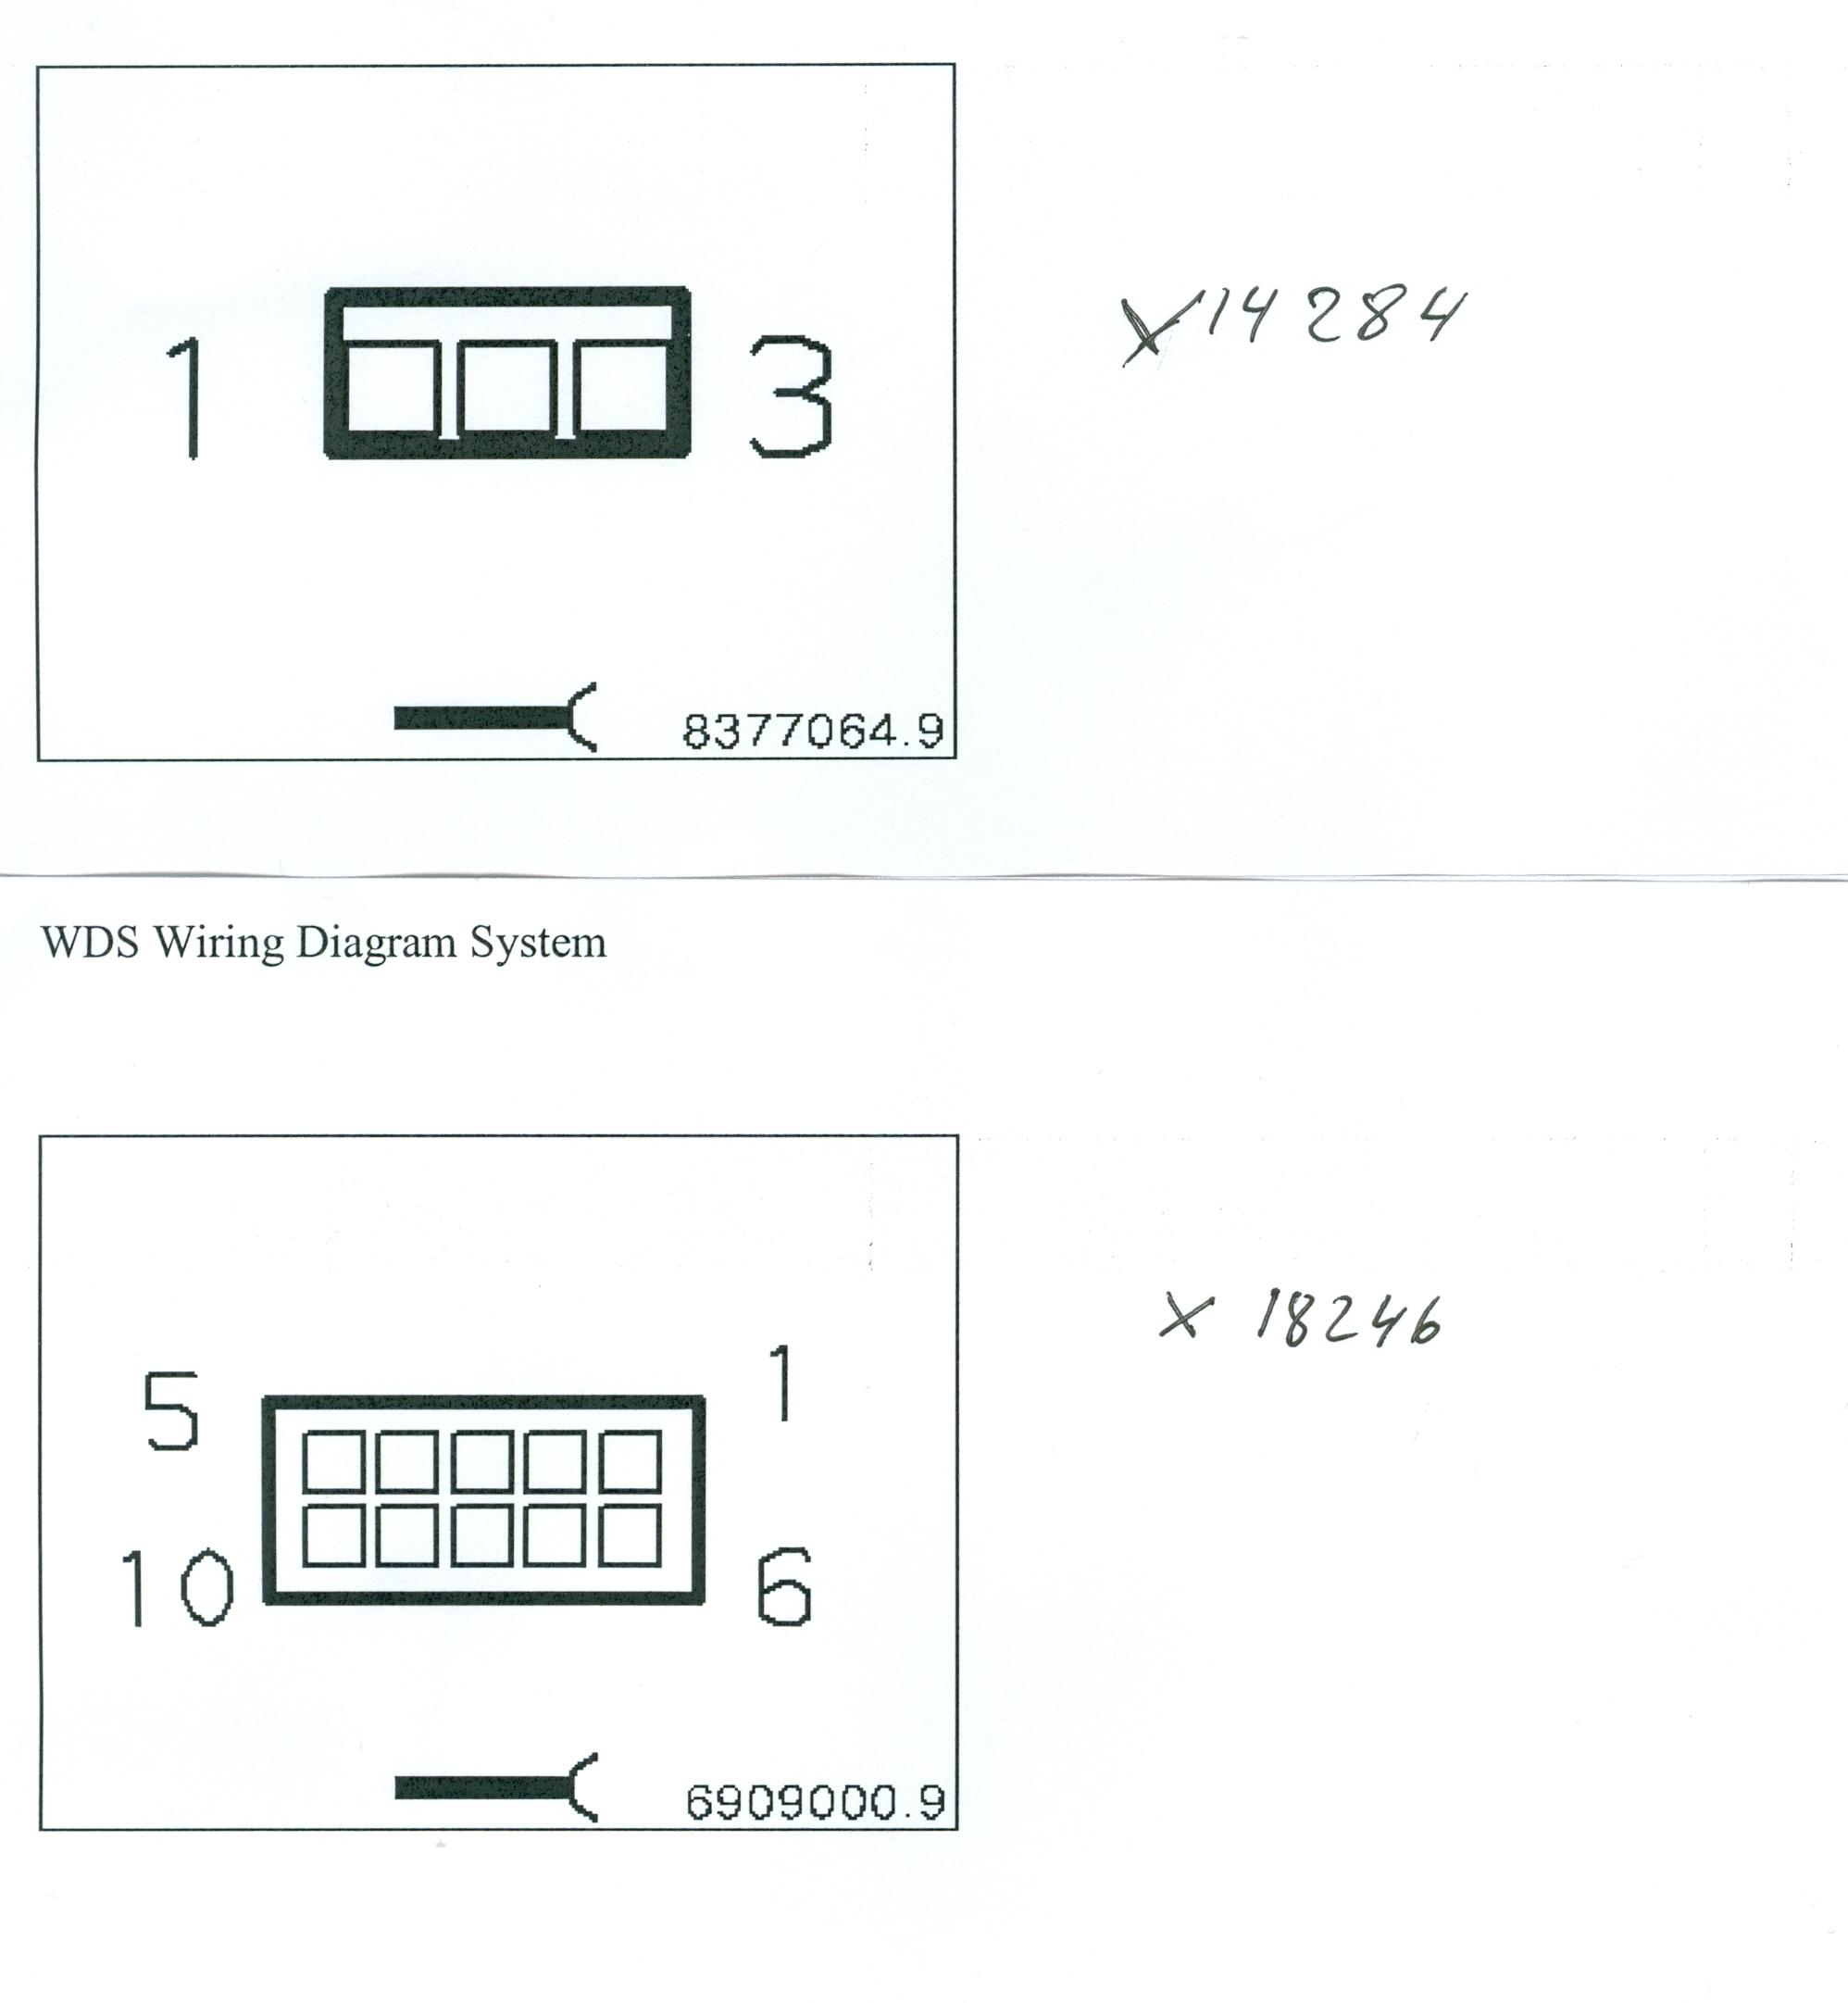 Wds Bmw E60